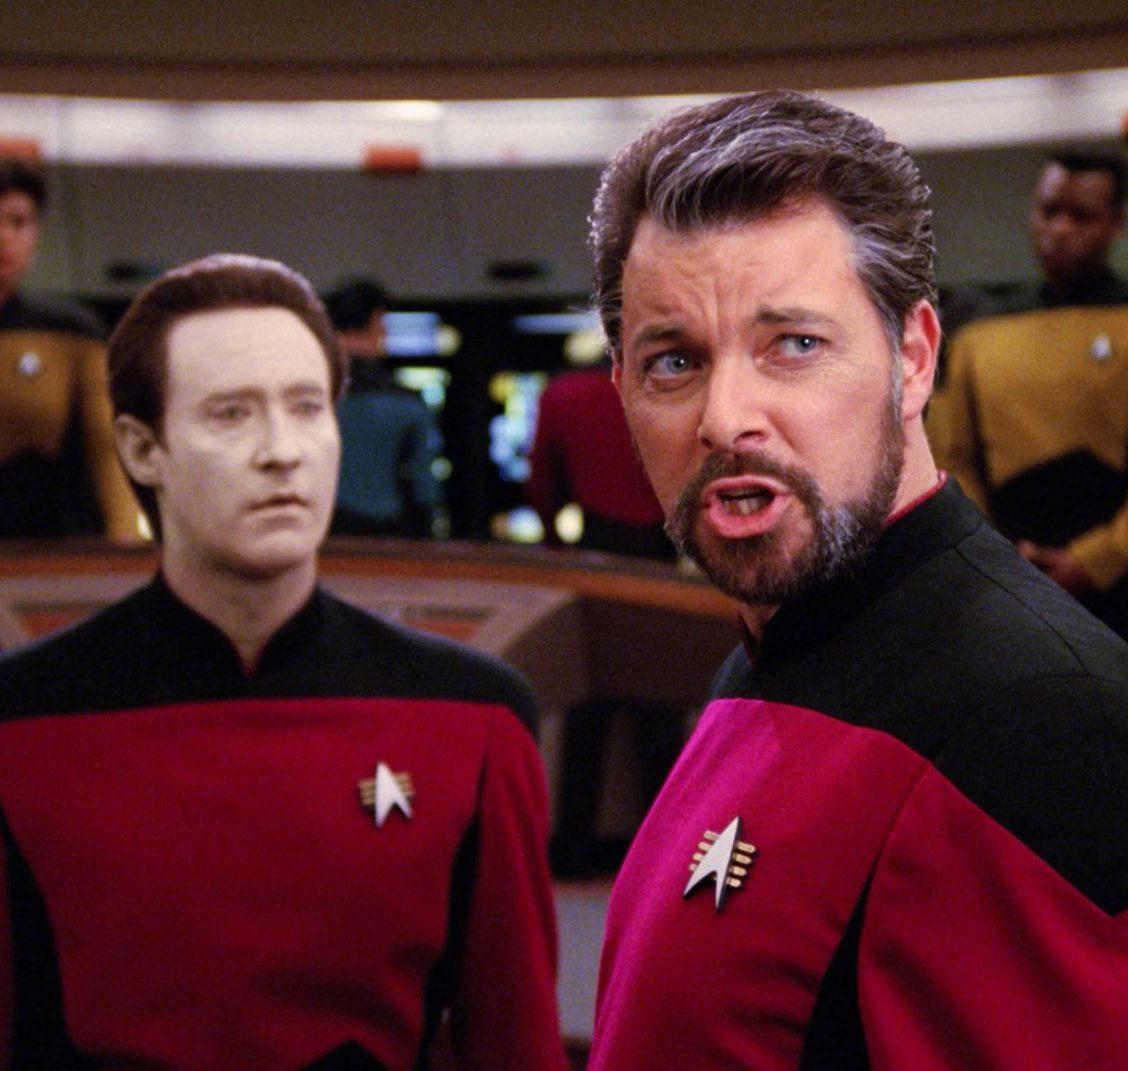 7 e1615888993468 30 Intergalactic Facts About Star Trek: The Next Generation